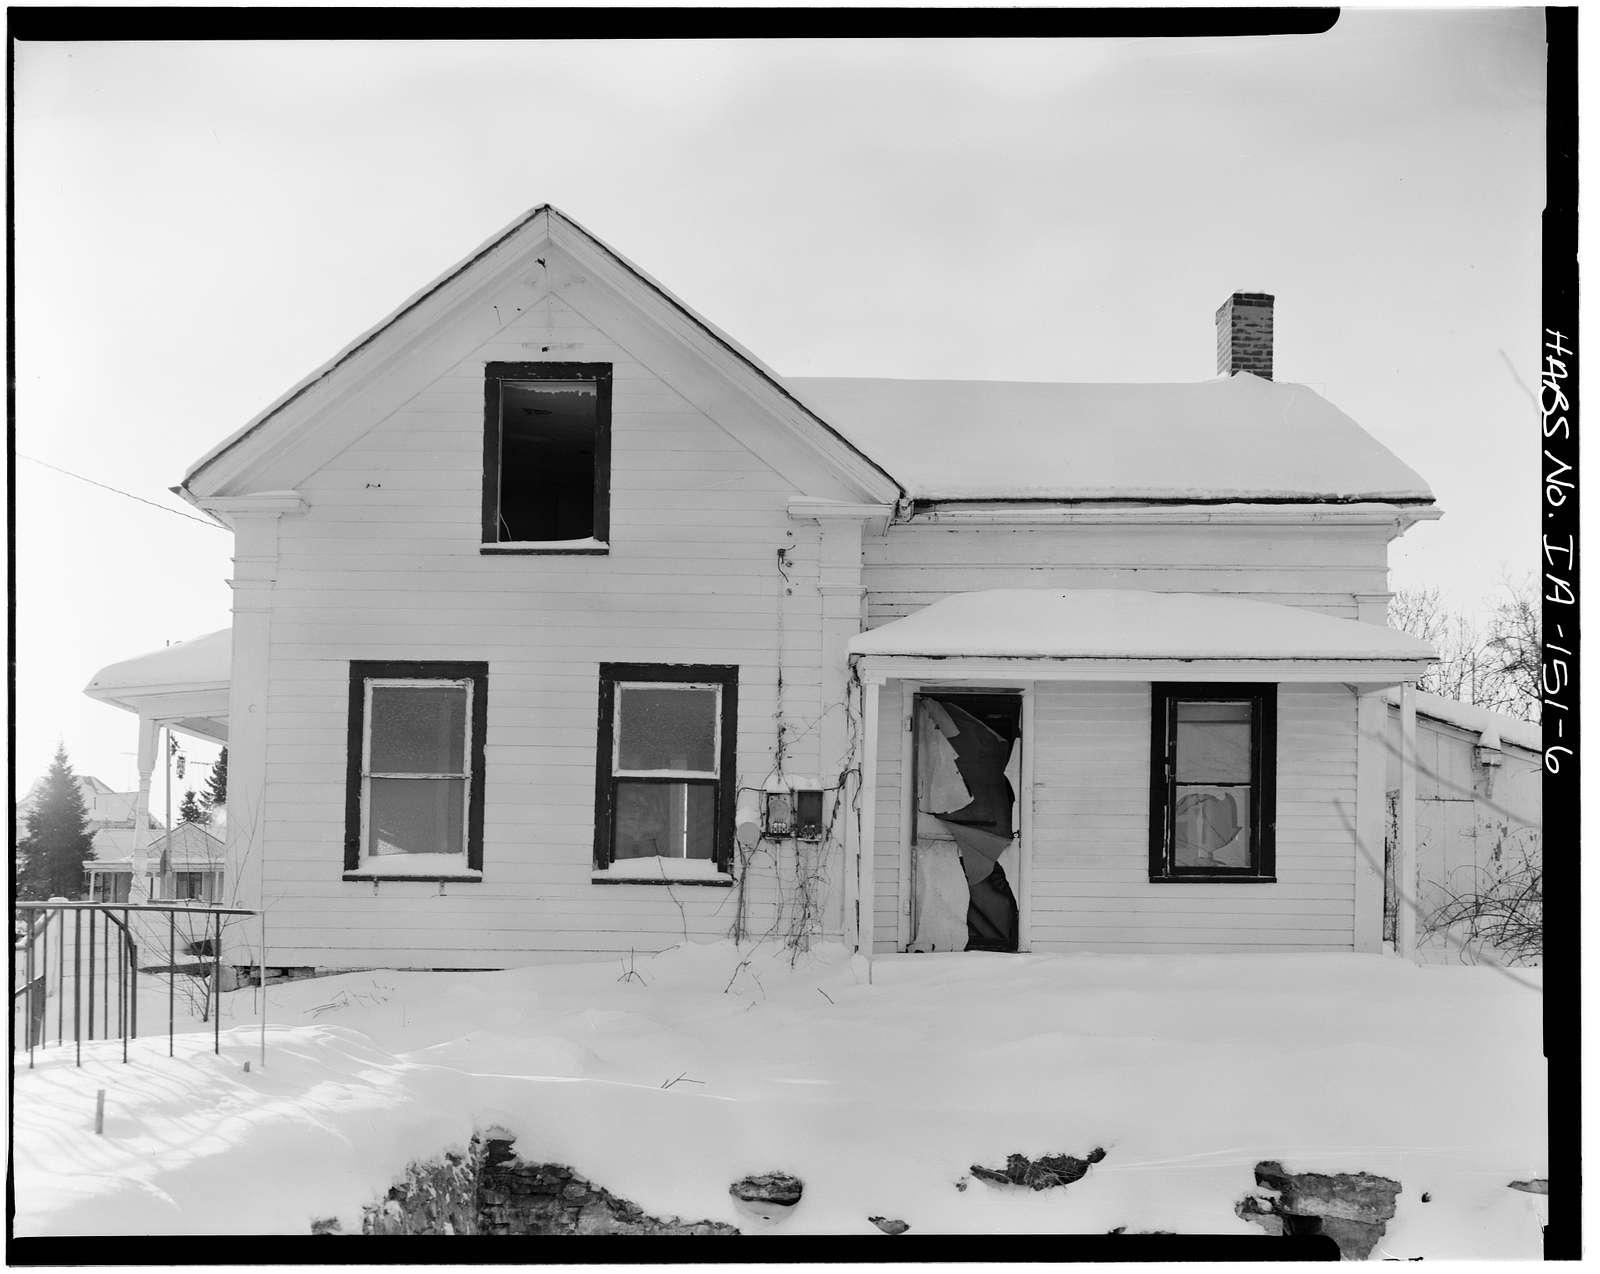 P. J. Almquist House, 16 Second Street Northwest, Waukon, Allamakee County, IA